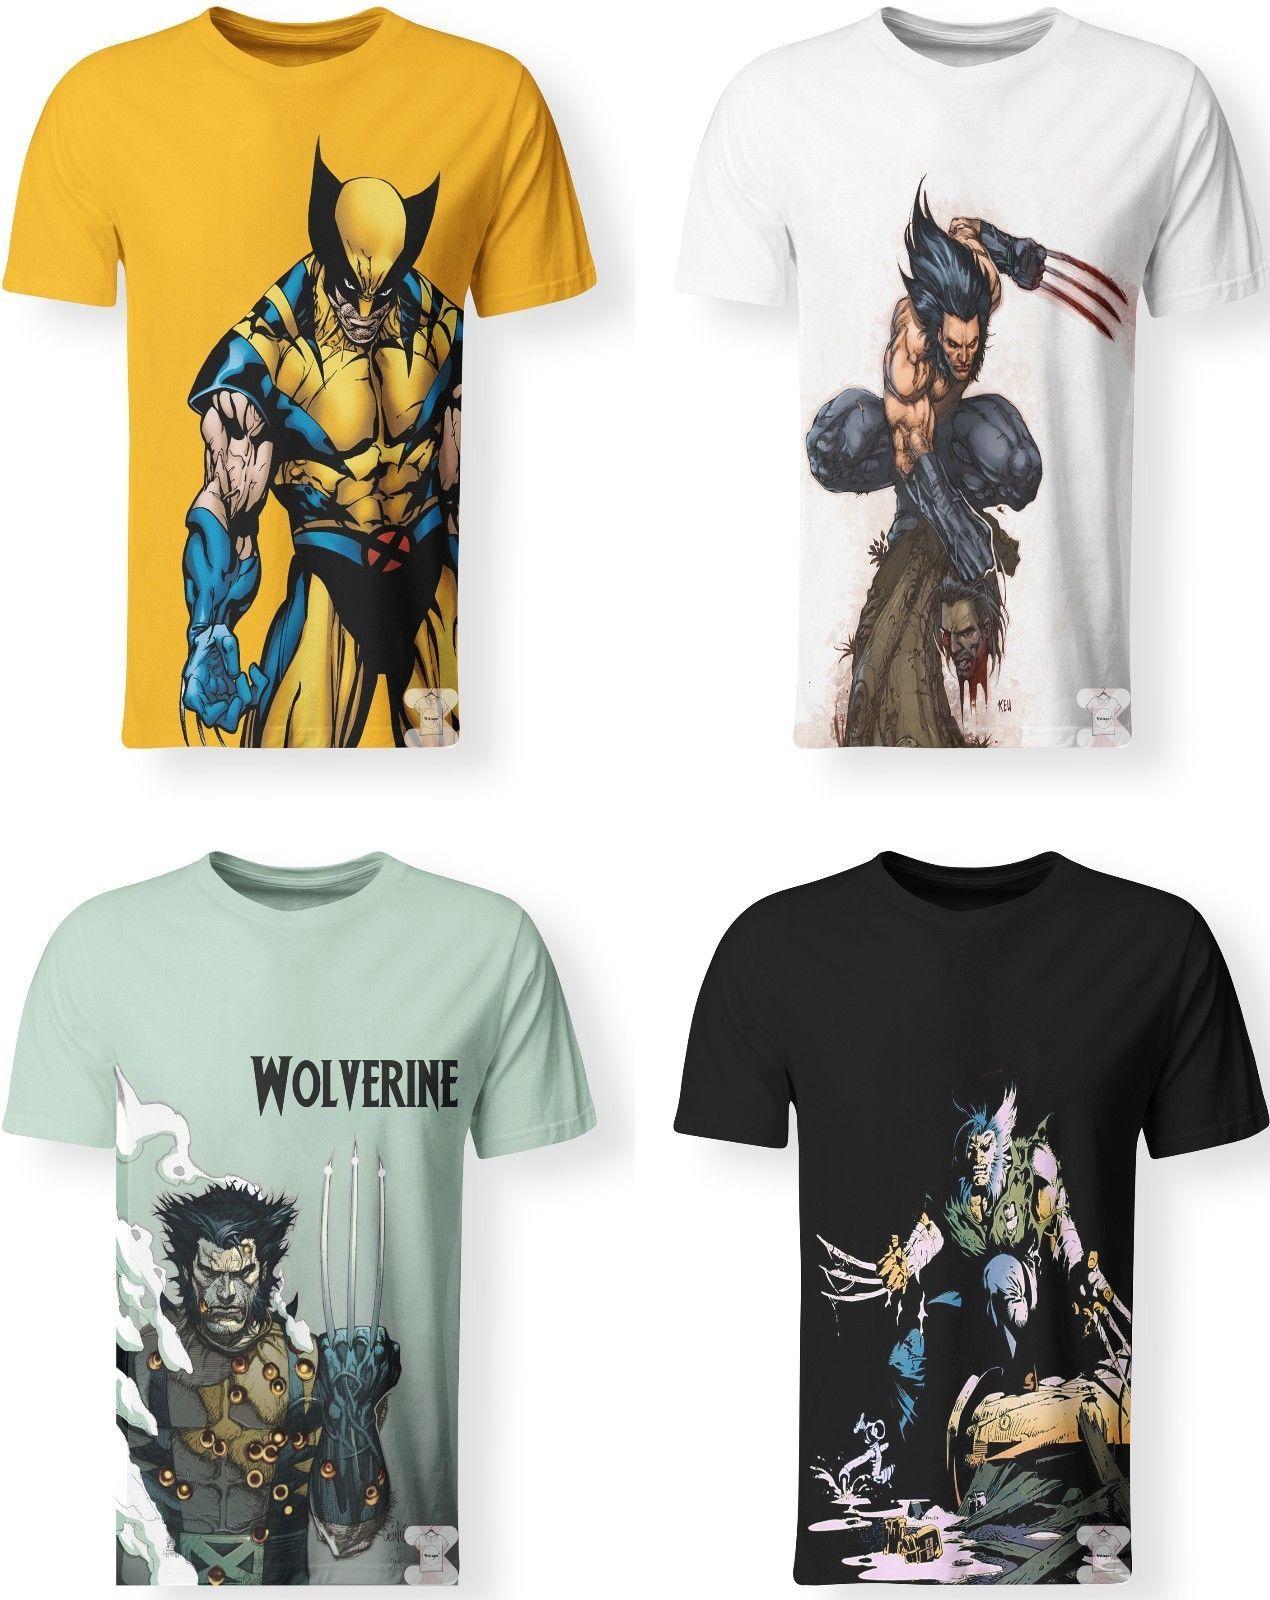 0435b7b30 Wolverine Logan Marvel Comics X Men Avengers T Shirt 3D Print Men Women S  7XL Funny Unisex Casual Gift Designs Shirts Interesting T Shirt Designs  From ...